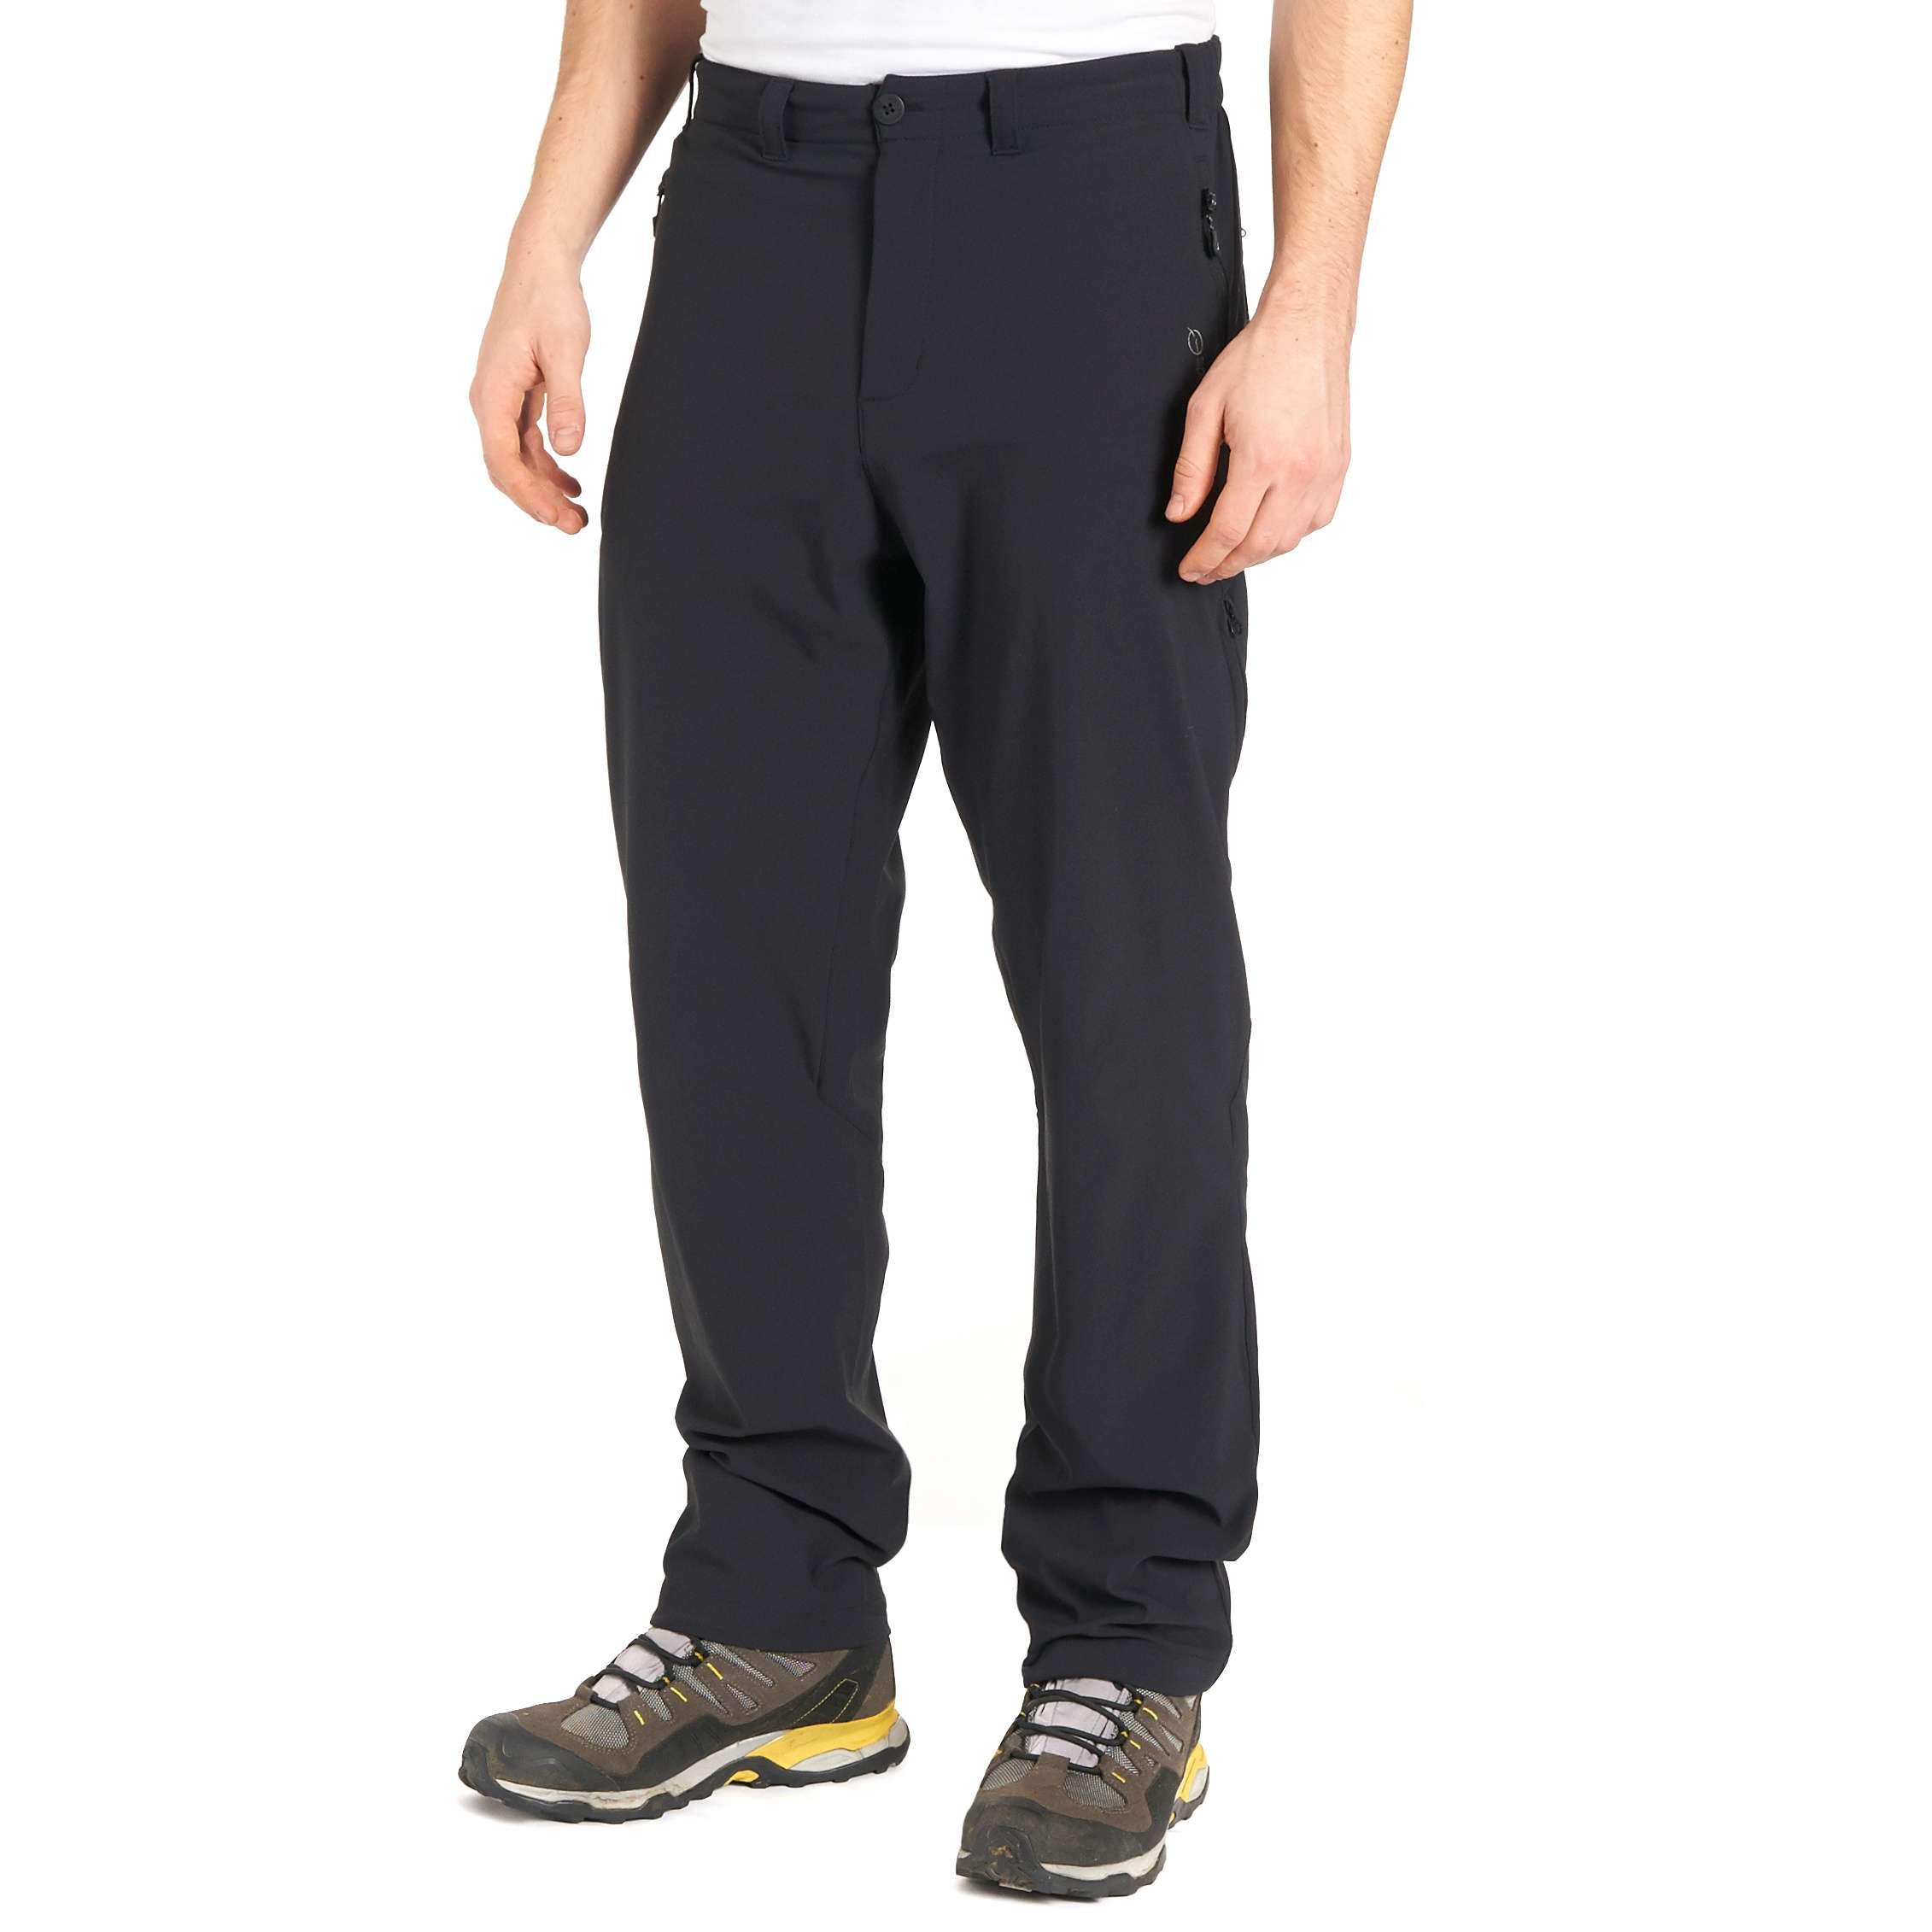 SPRAYWAY Men's Challenger Softshell Pants